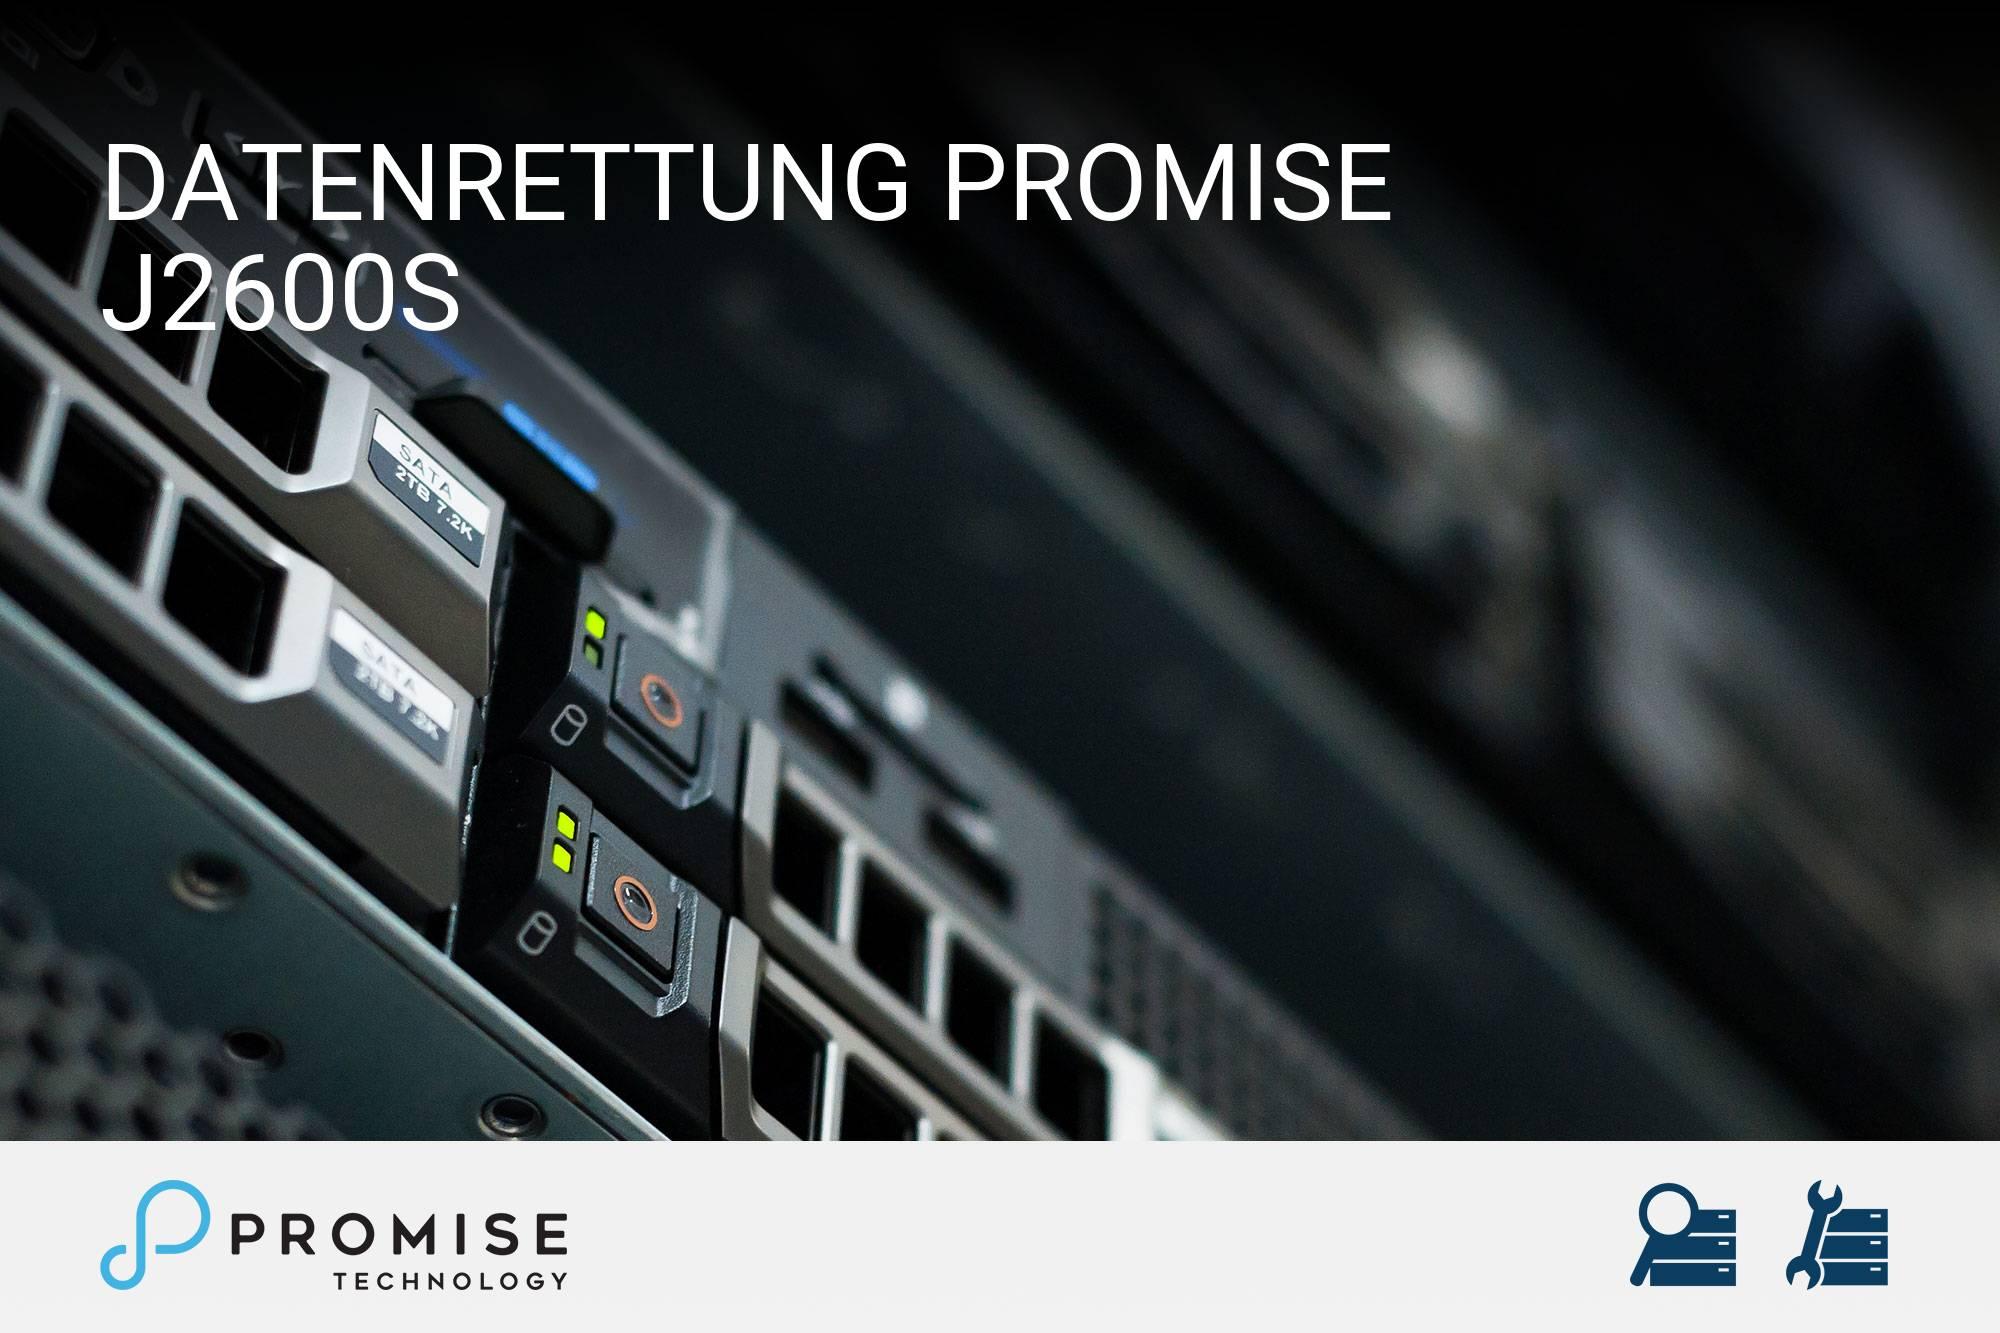 Promise J2600s